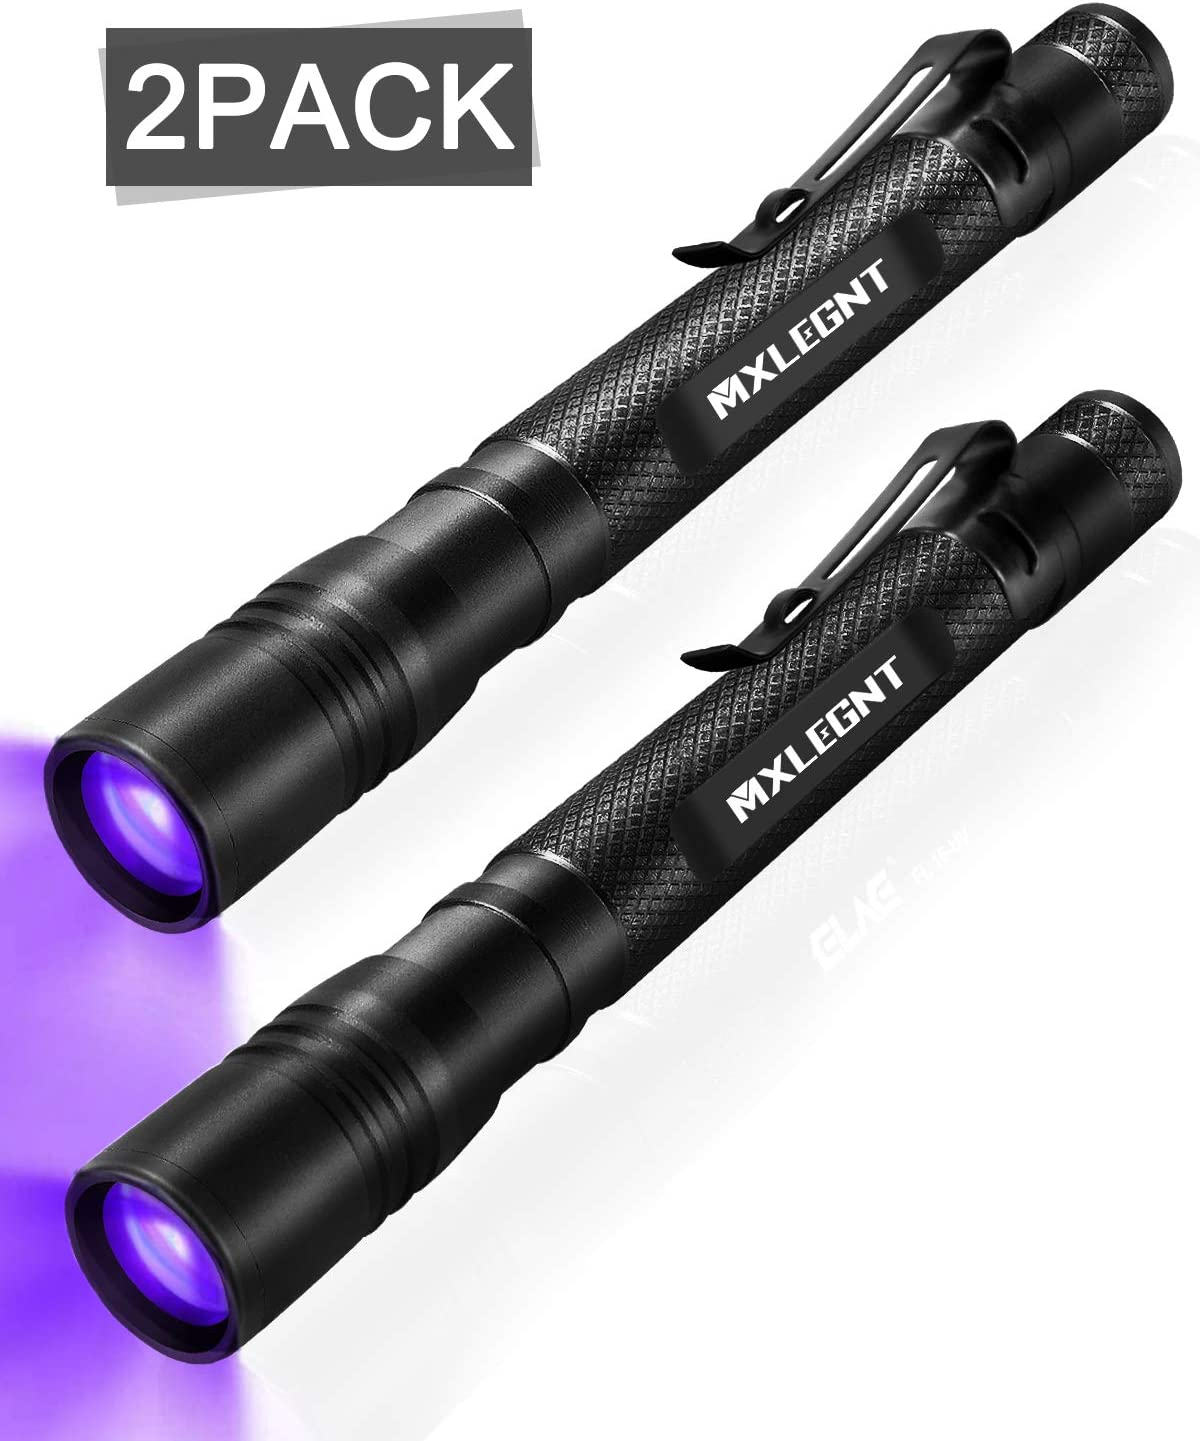 and Dye Detector Scorpion Stain Pet Urine LED UV Torch Mini Blacklight Ultraviolet Pen Lights for Leak and Hotel Inspection Bed Bug UV Black Light Flashlight 2 Pack